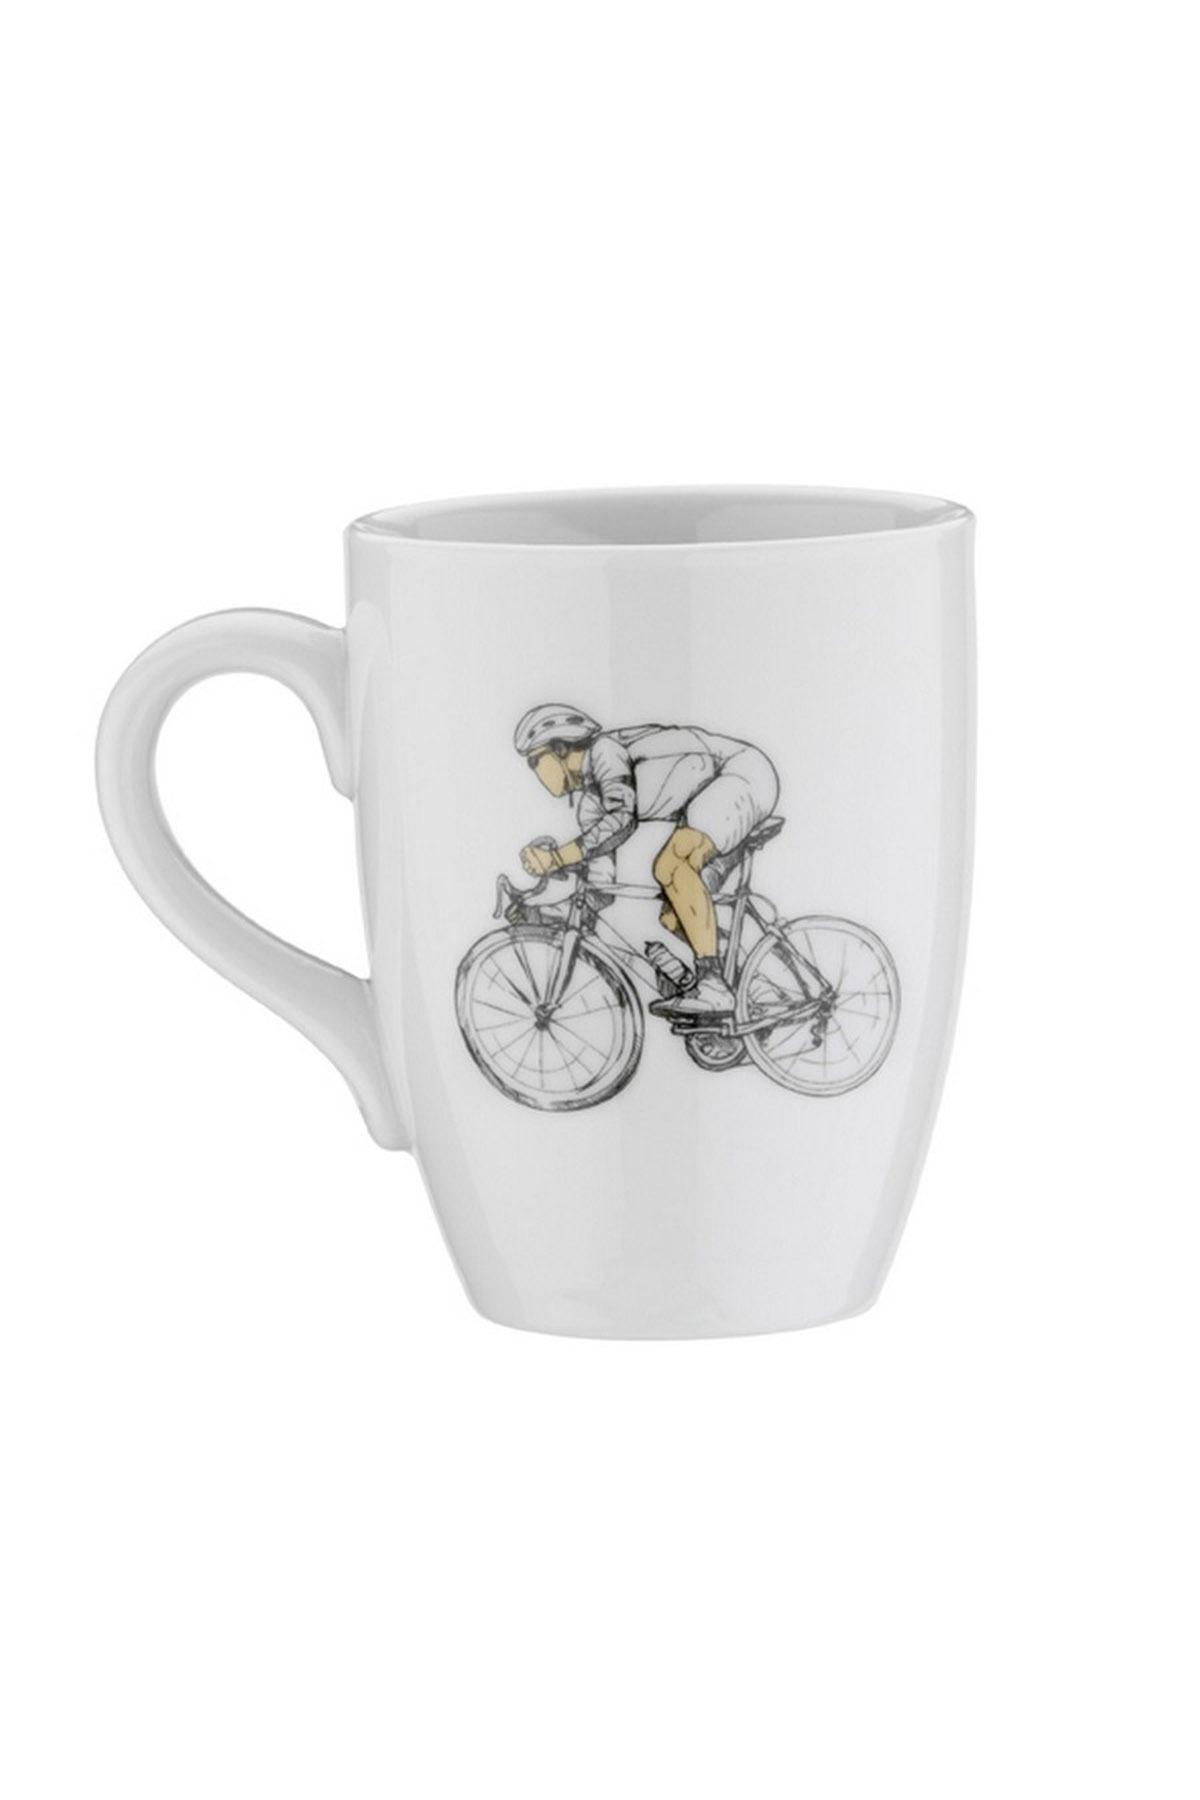 Kütahya Porselen Sporcu Mug Bardak Bisiklet